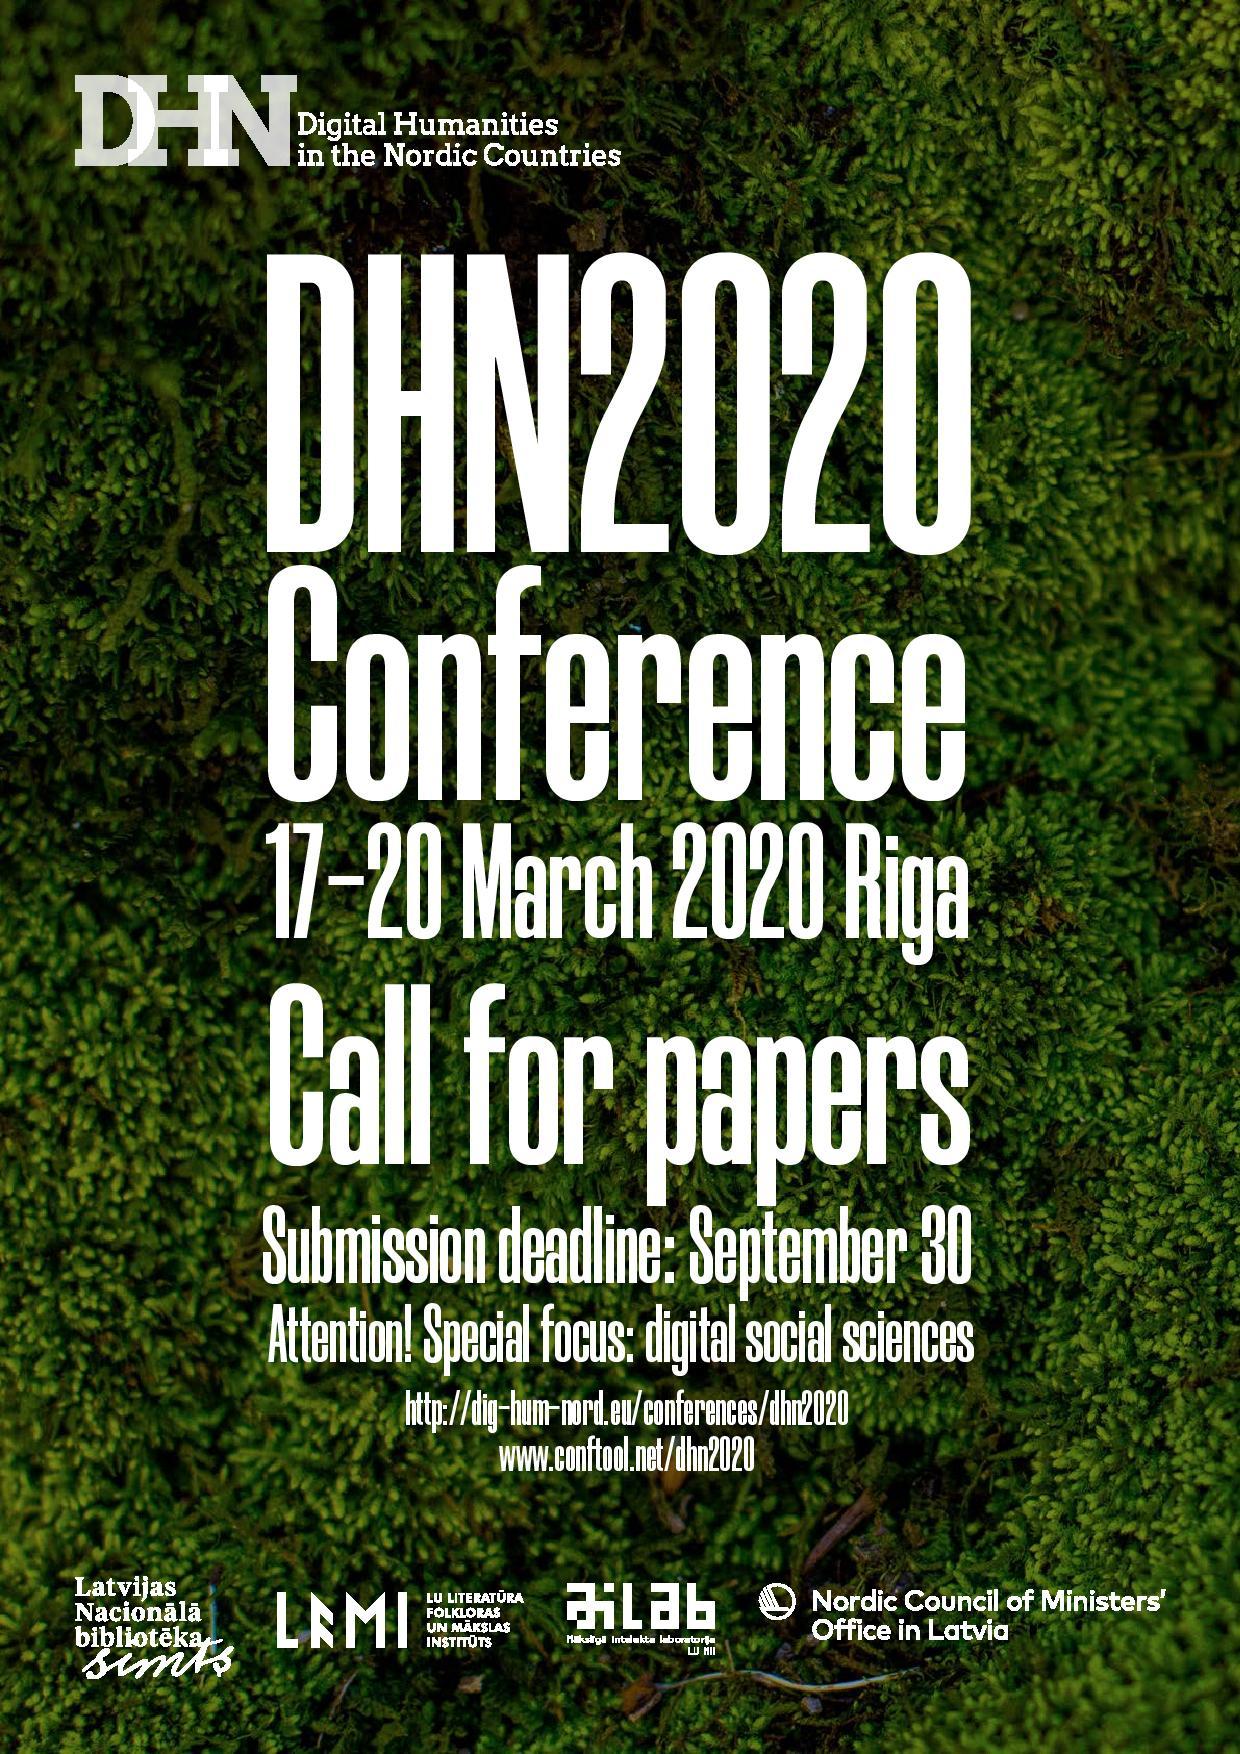 CFP DHN2020